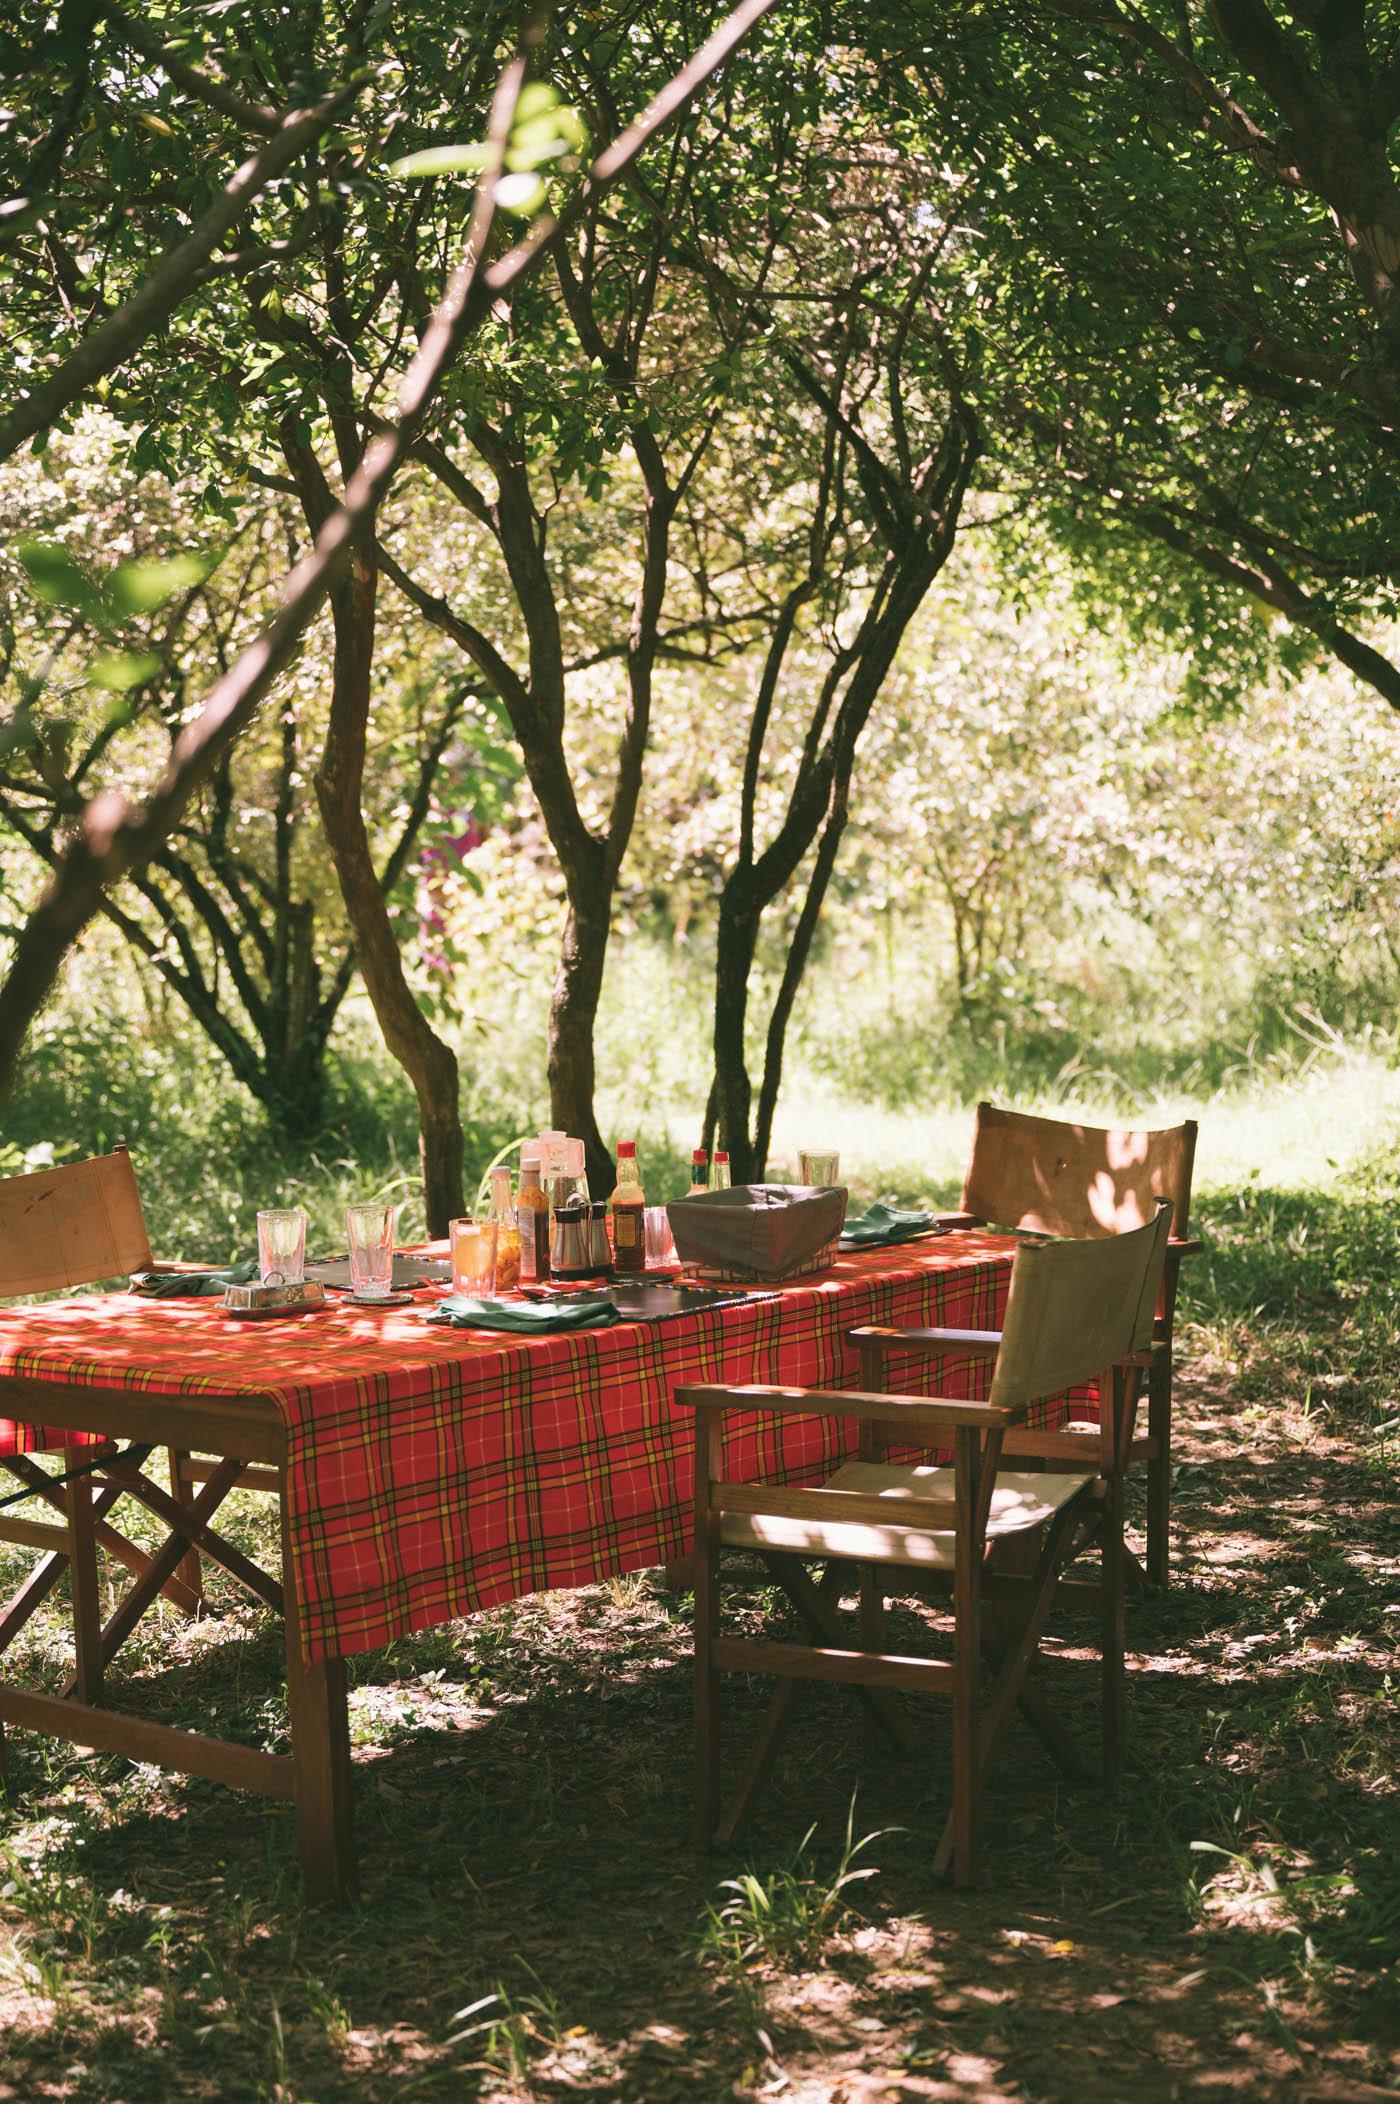 Lunch setting at Tangulia Mara Camp in the Maasai Mara in Kenya